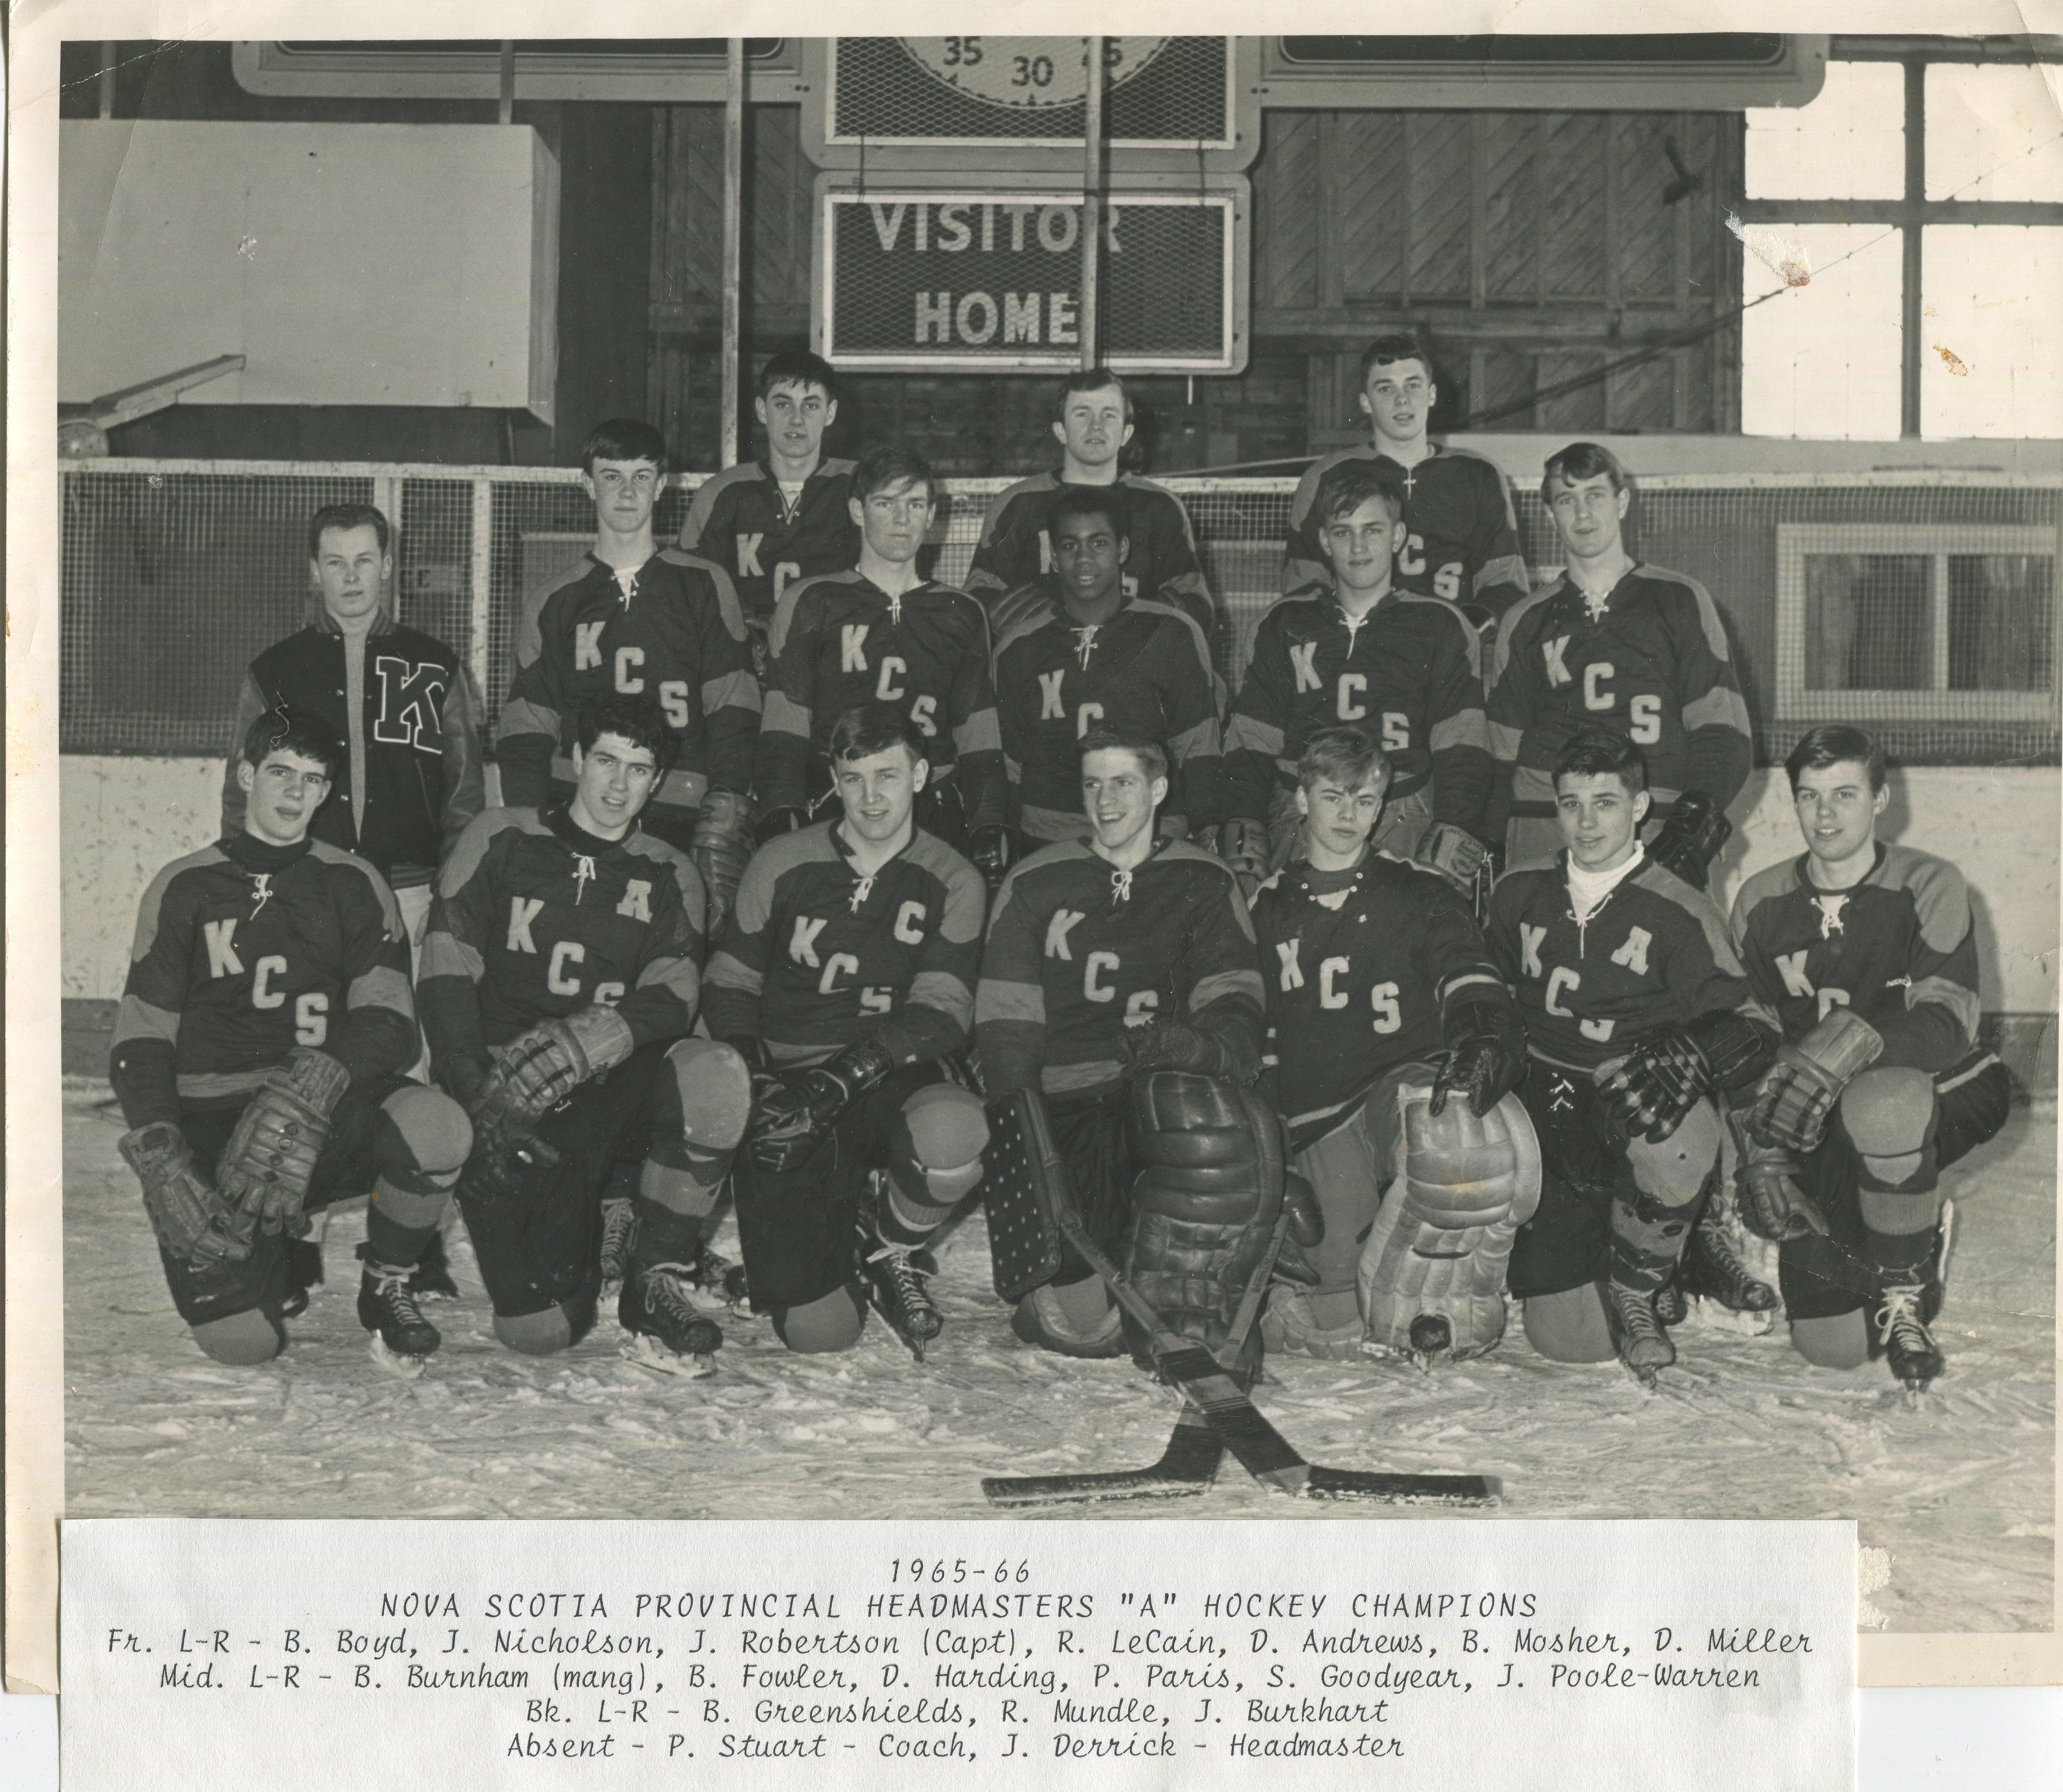 Dave_Andrews_-_NS_Pro_Headmasters_A_Champions_1965-66.jpg